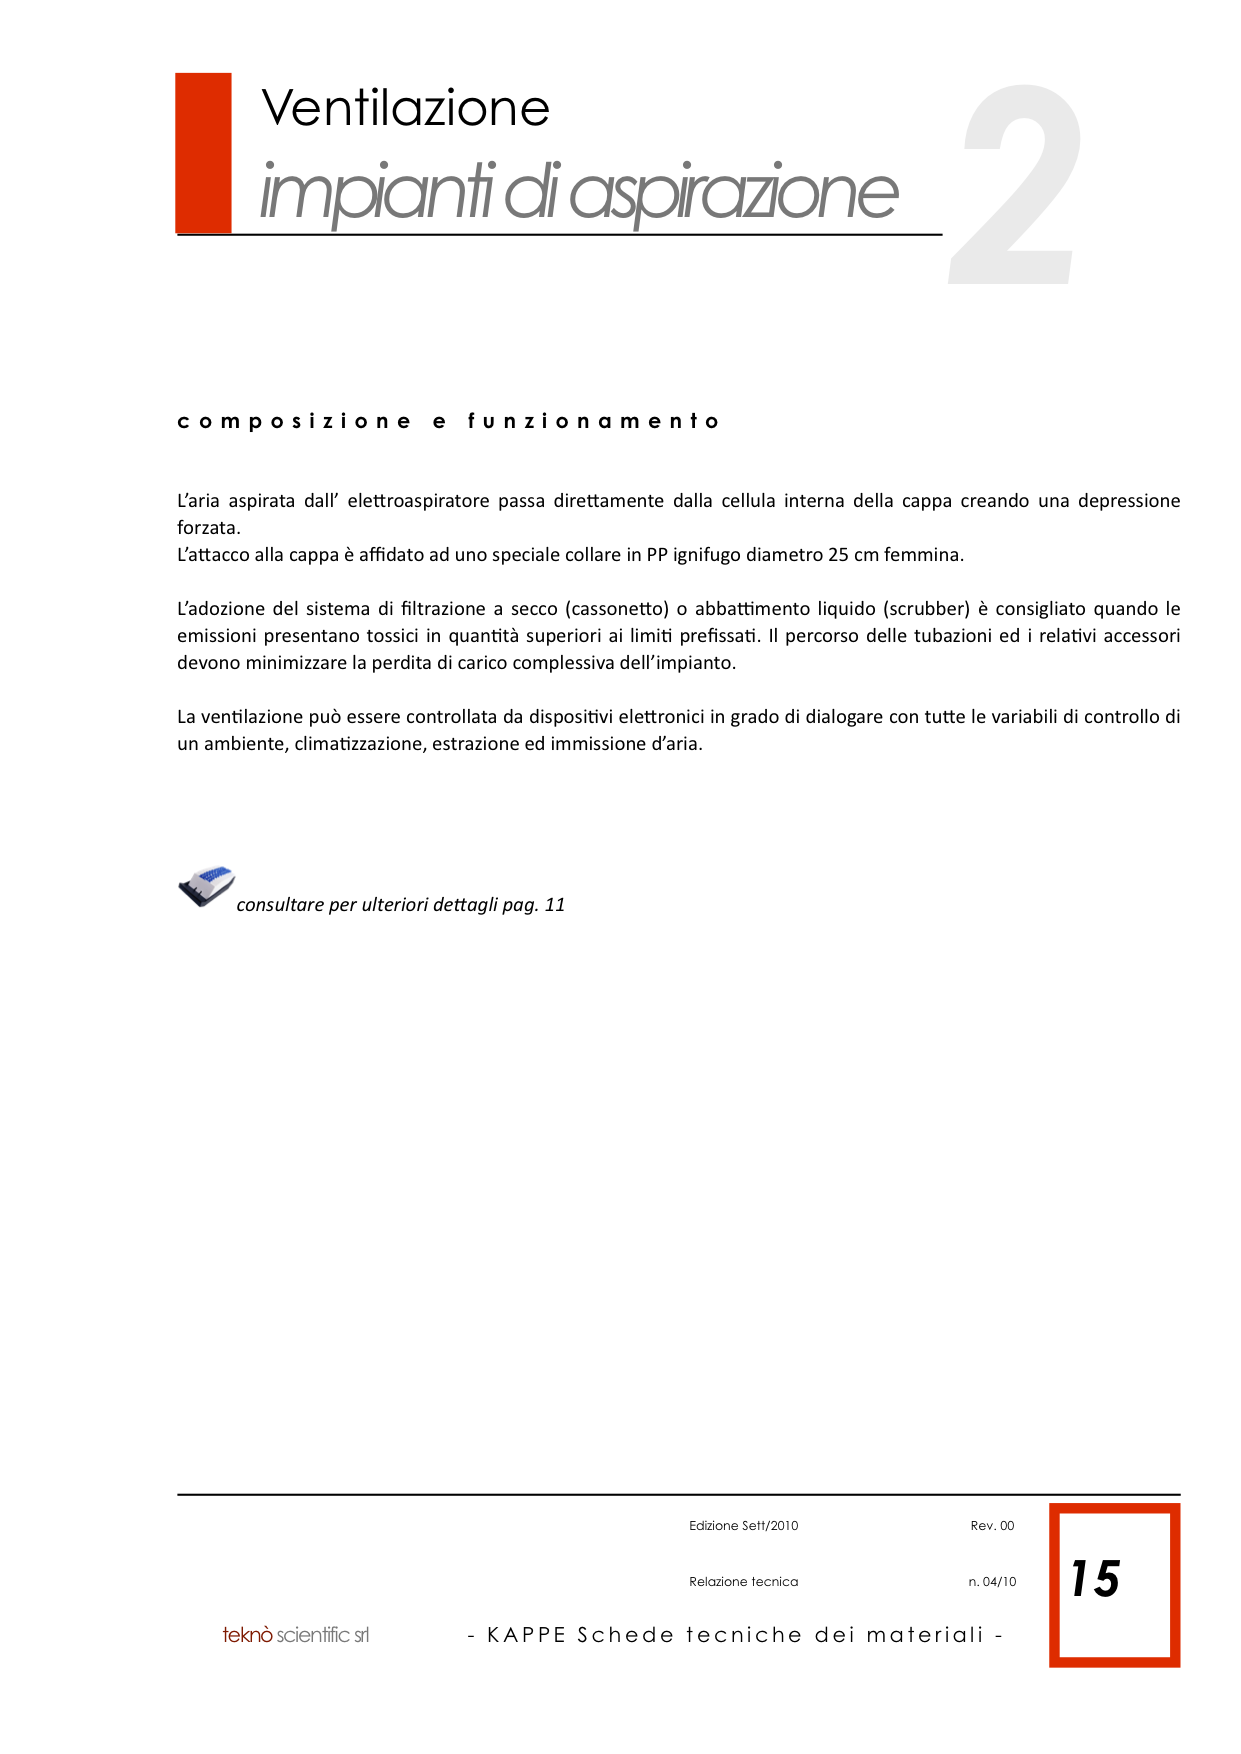 KAPPE Schede tecniche materiali copia 15.png